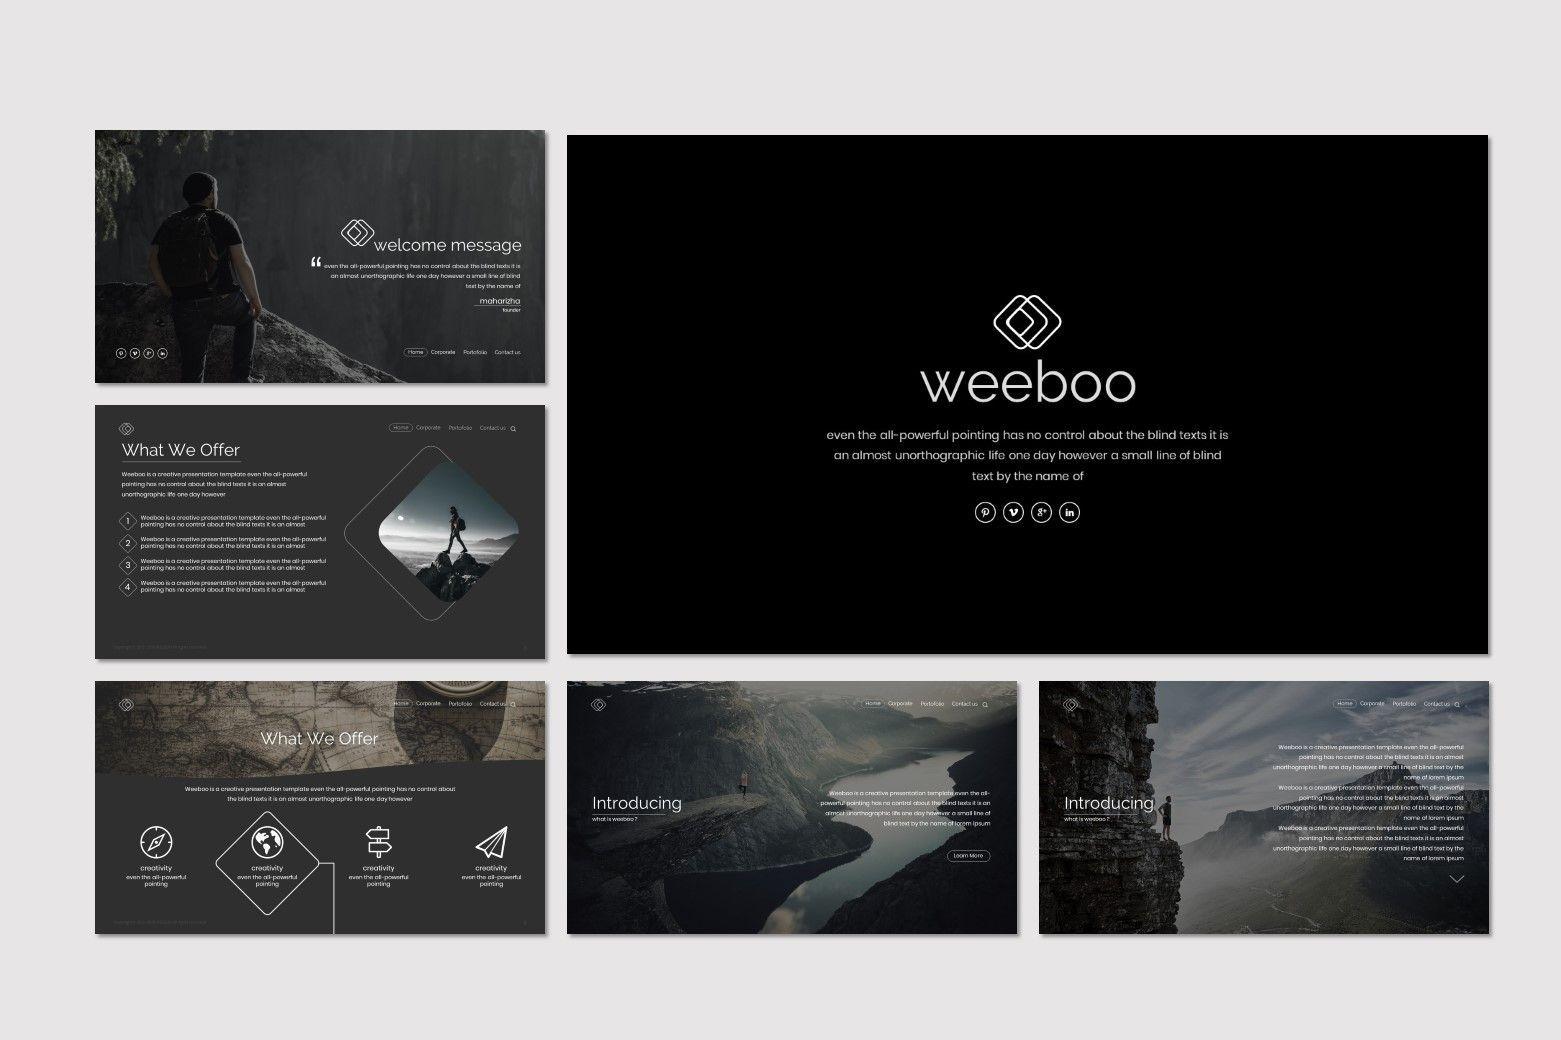 Weeboo - Google Slide Template, Slide 2, 07198, Presentation Templates — PoweredTemplate.com